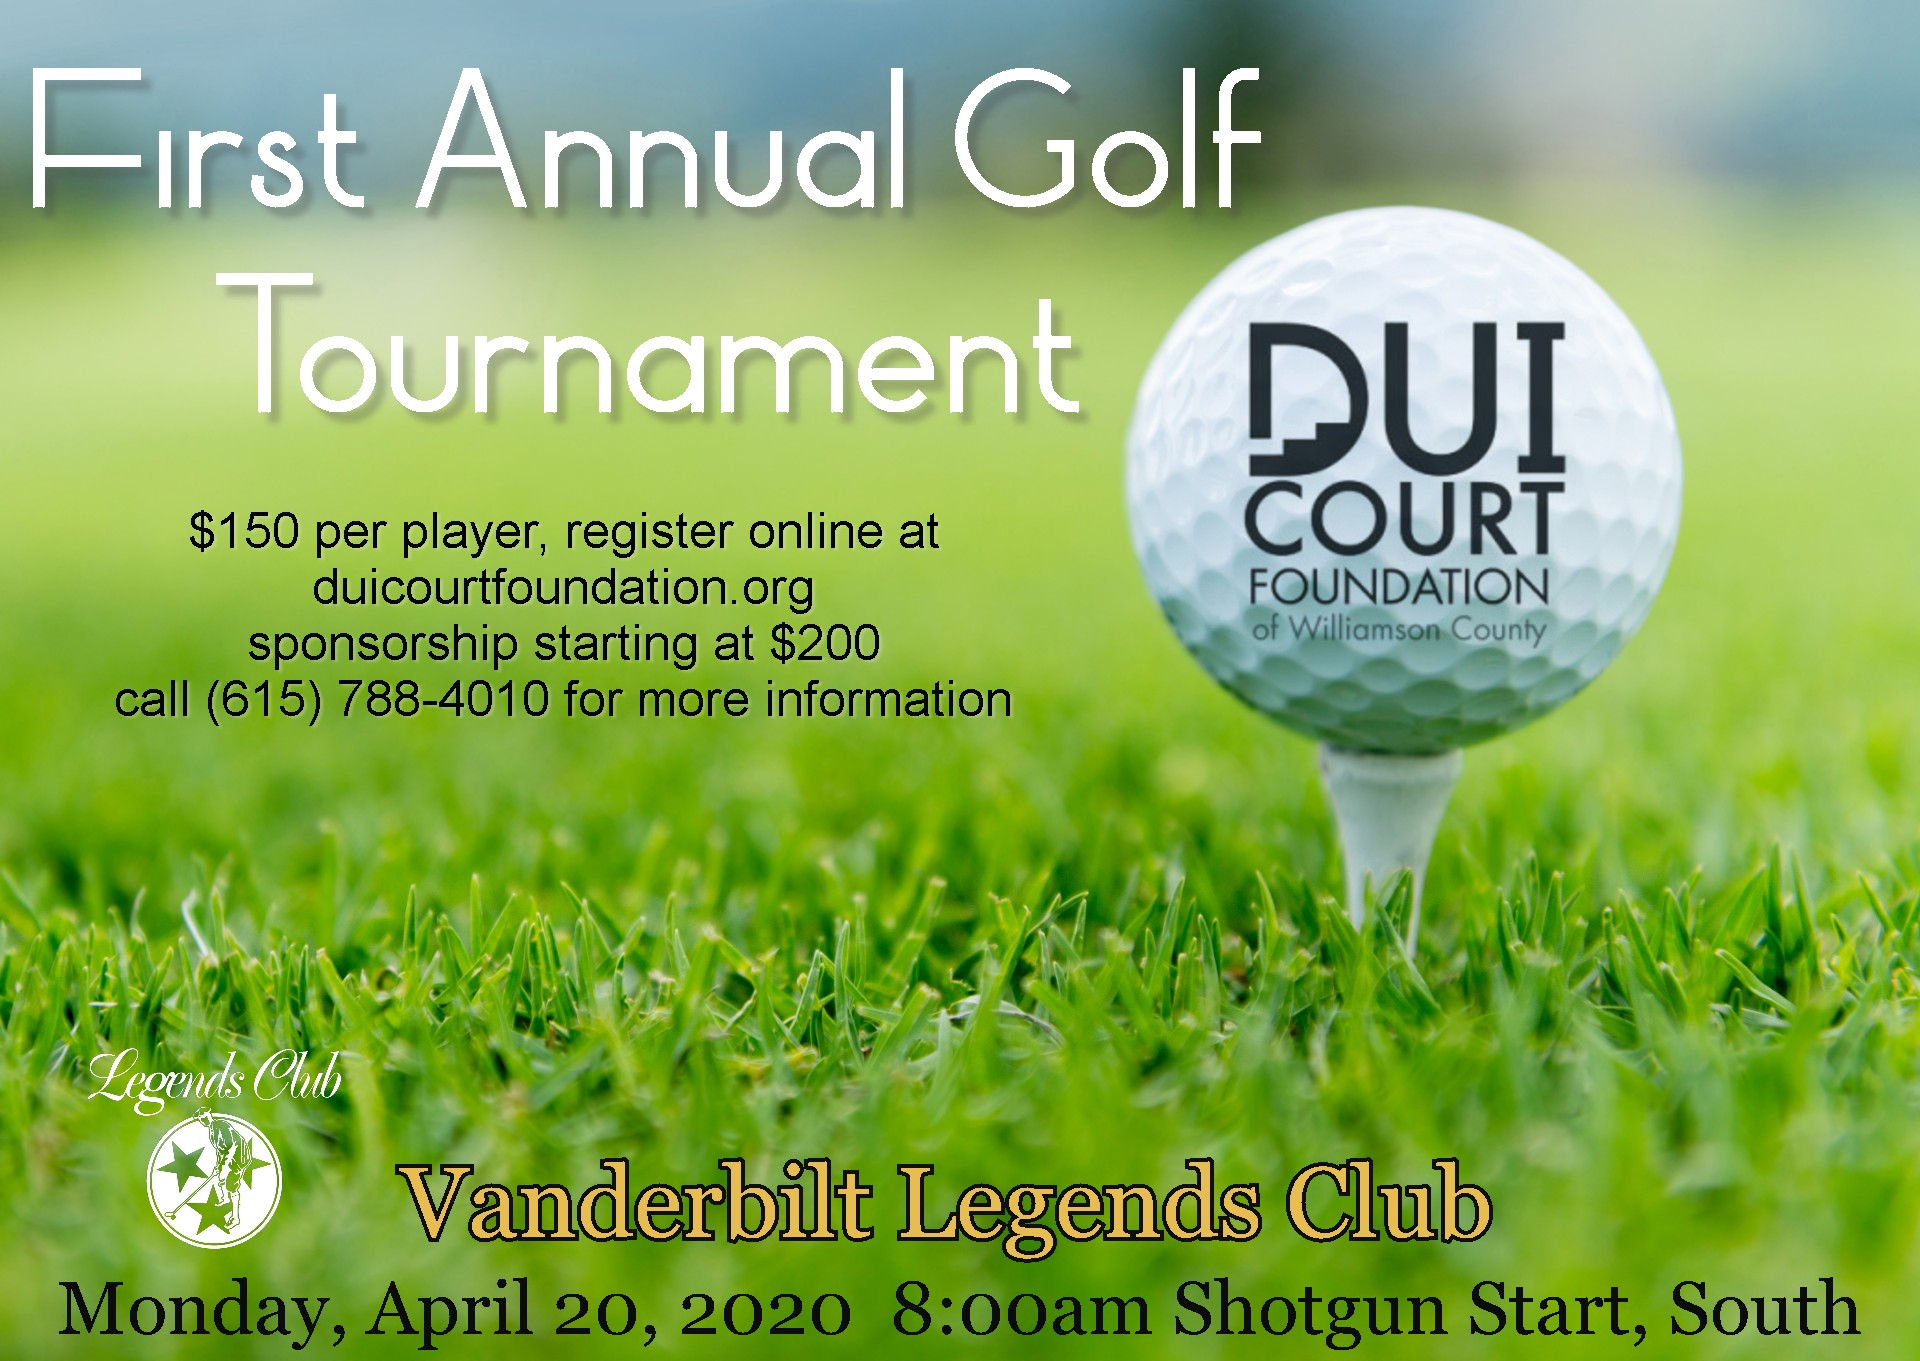 DCFWC Golf Tourn